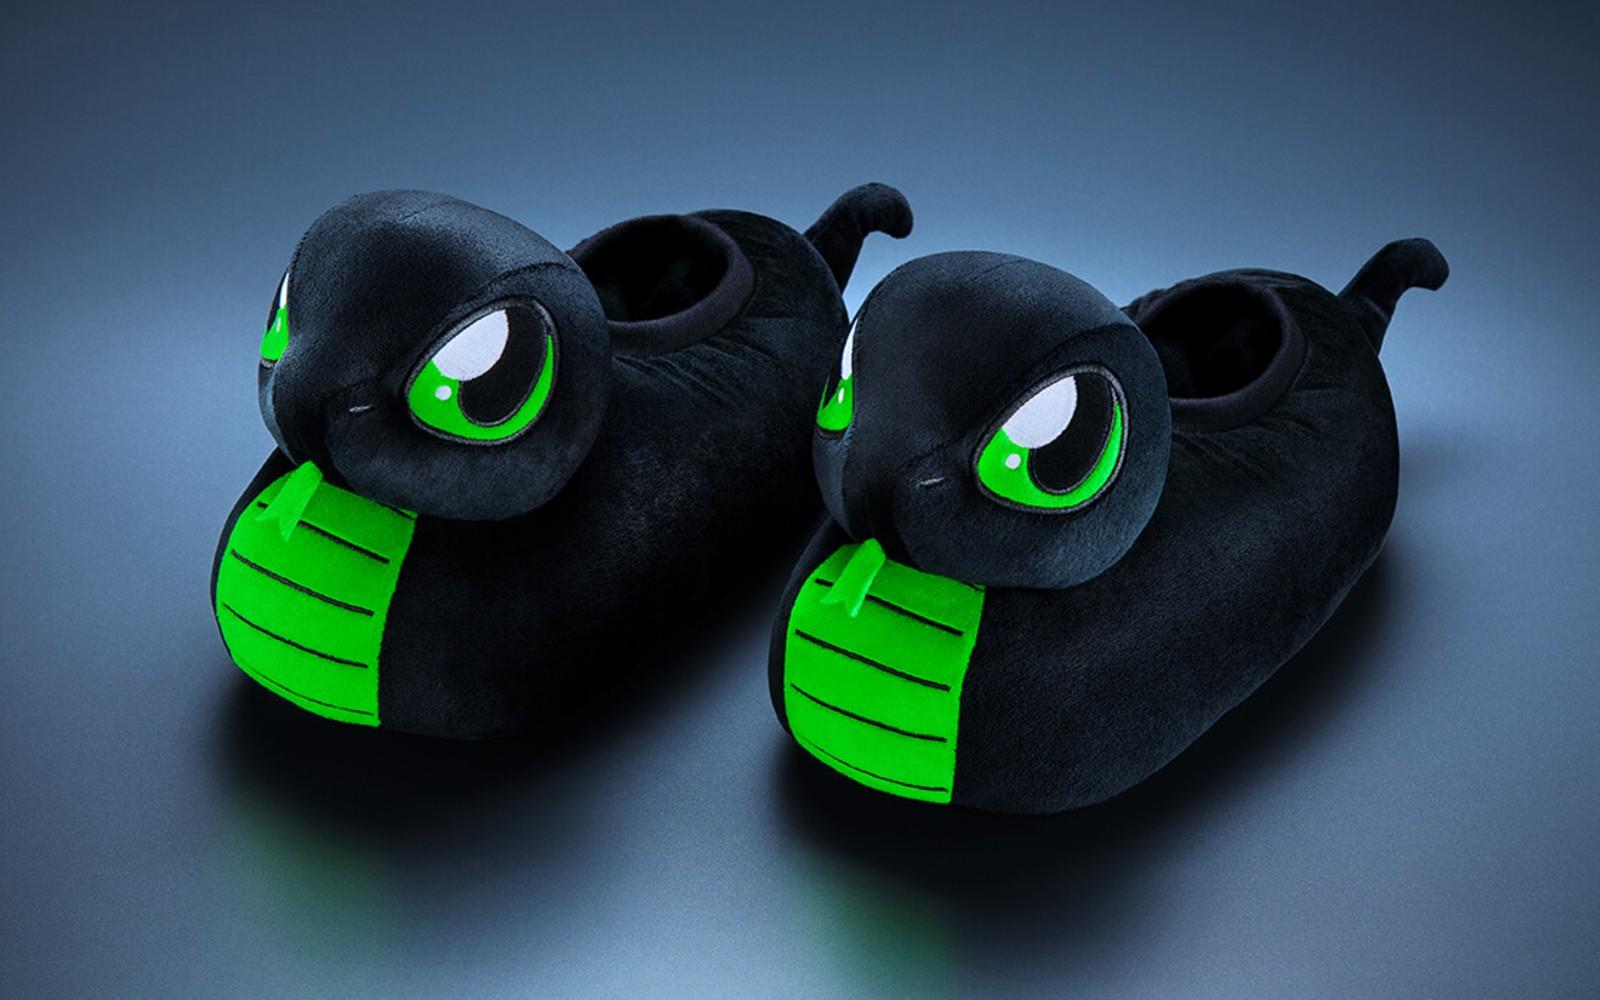 Razer made slippers for World Snake Day - Engadget